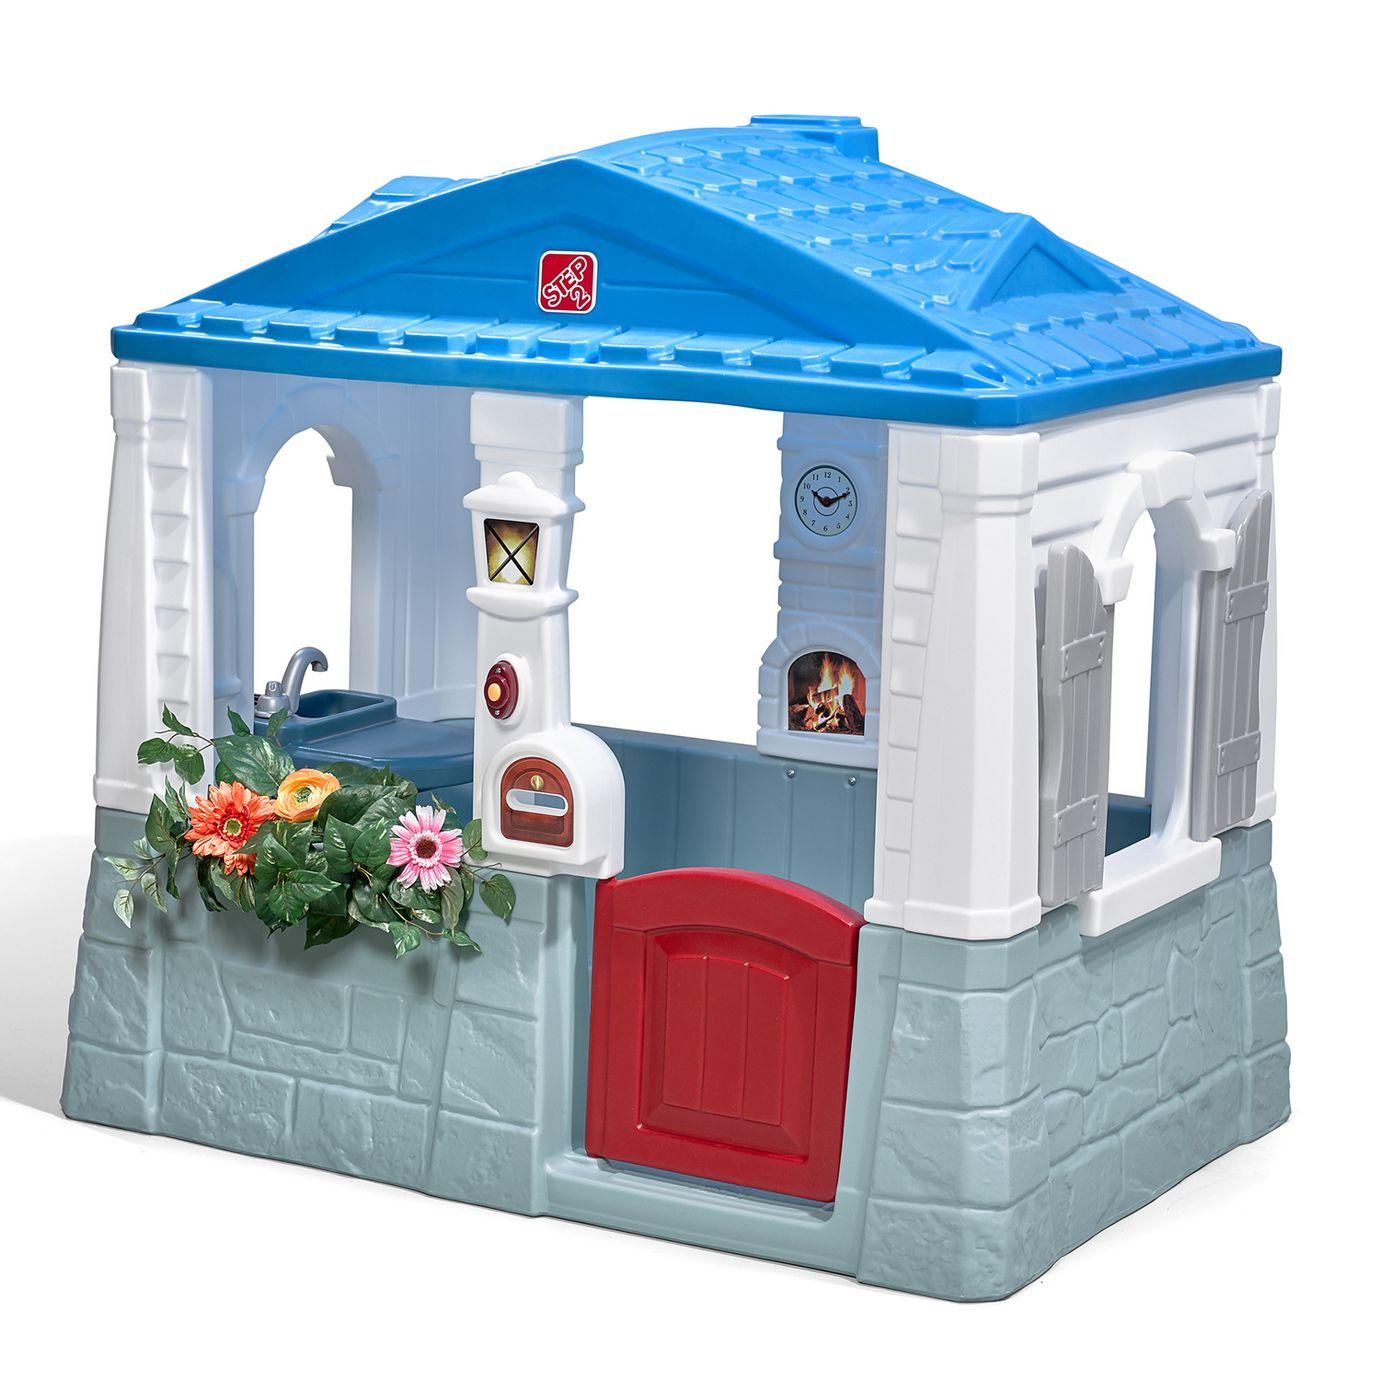 Step2 Neat & Tidy II Cottage Play House + $25 Kohls Rewards